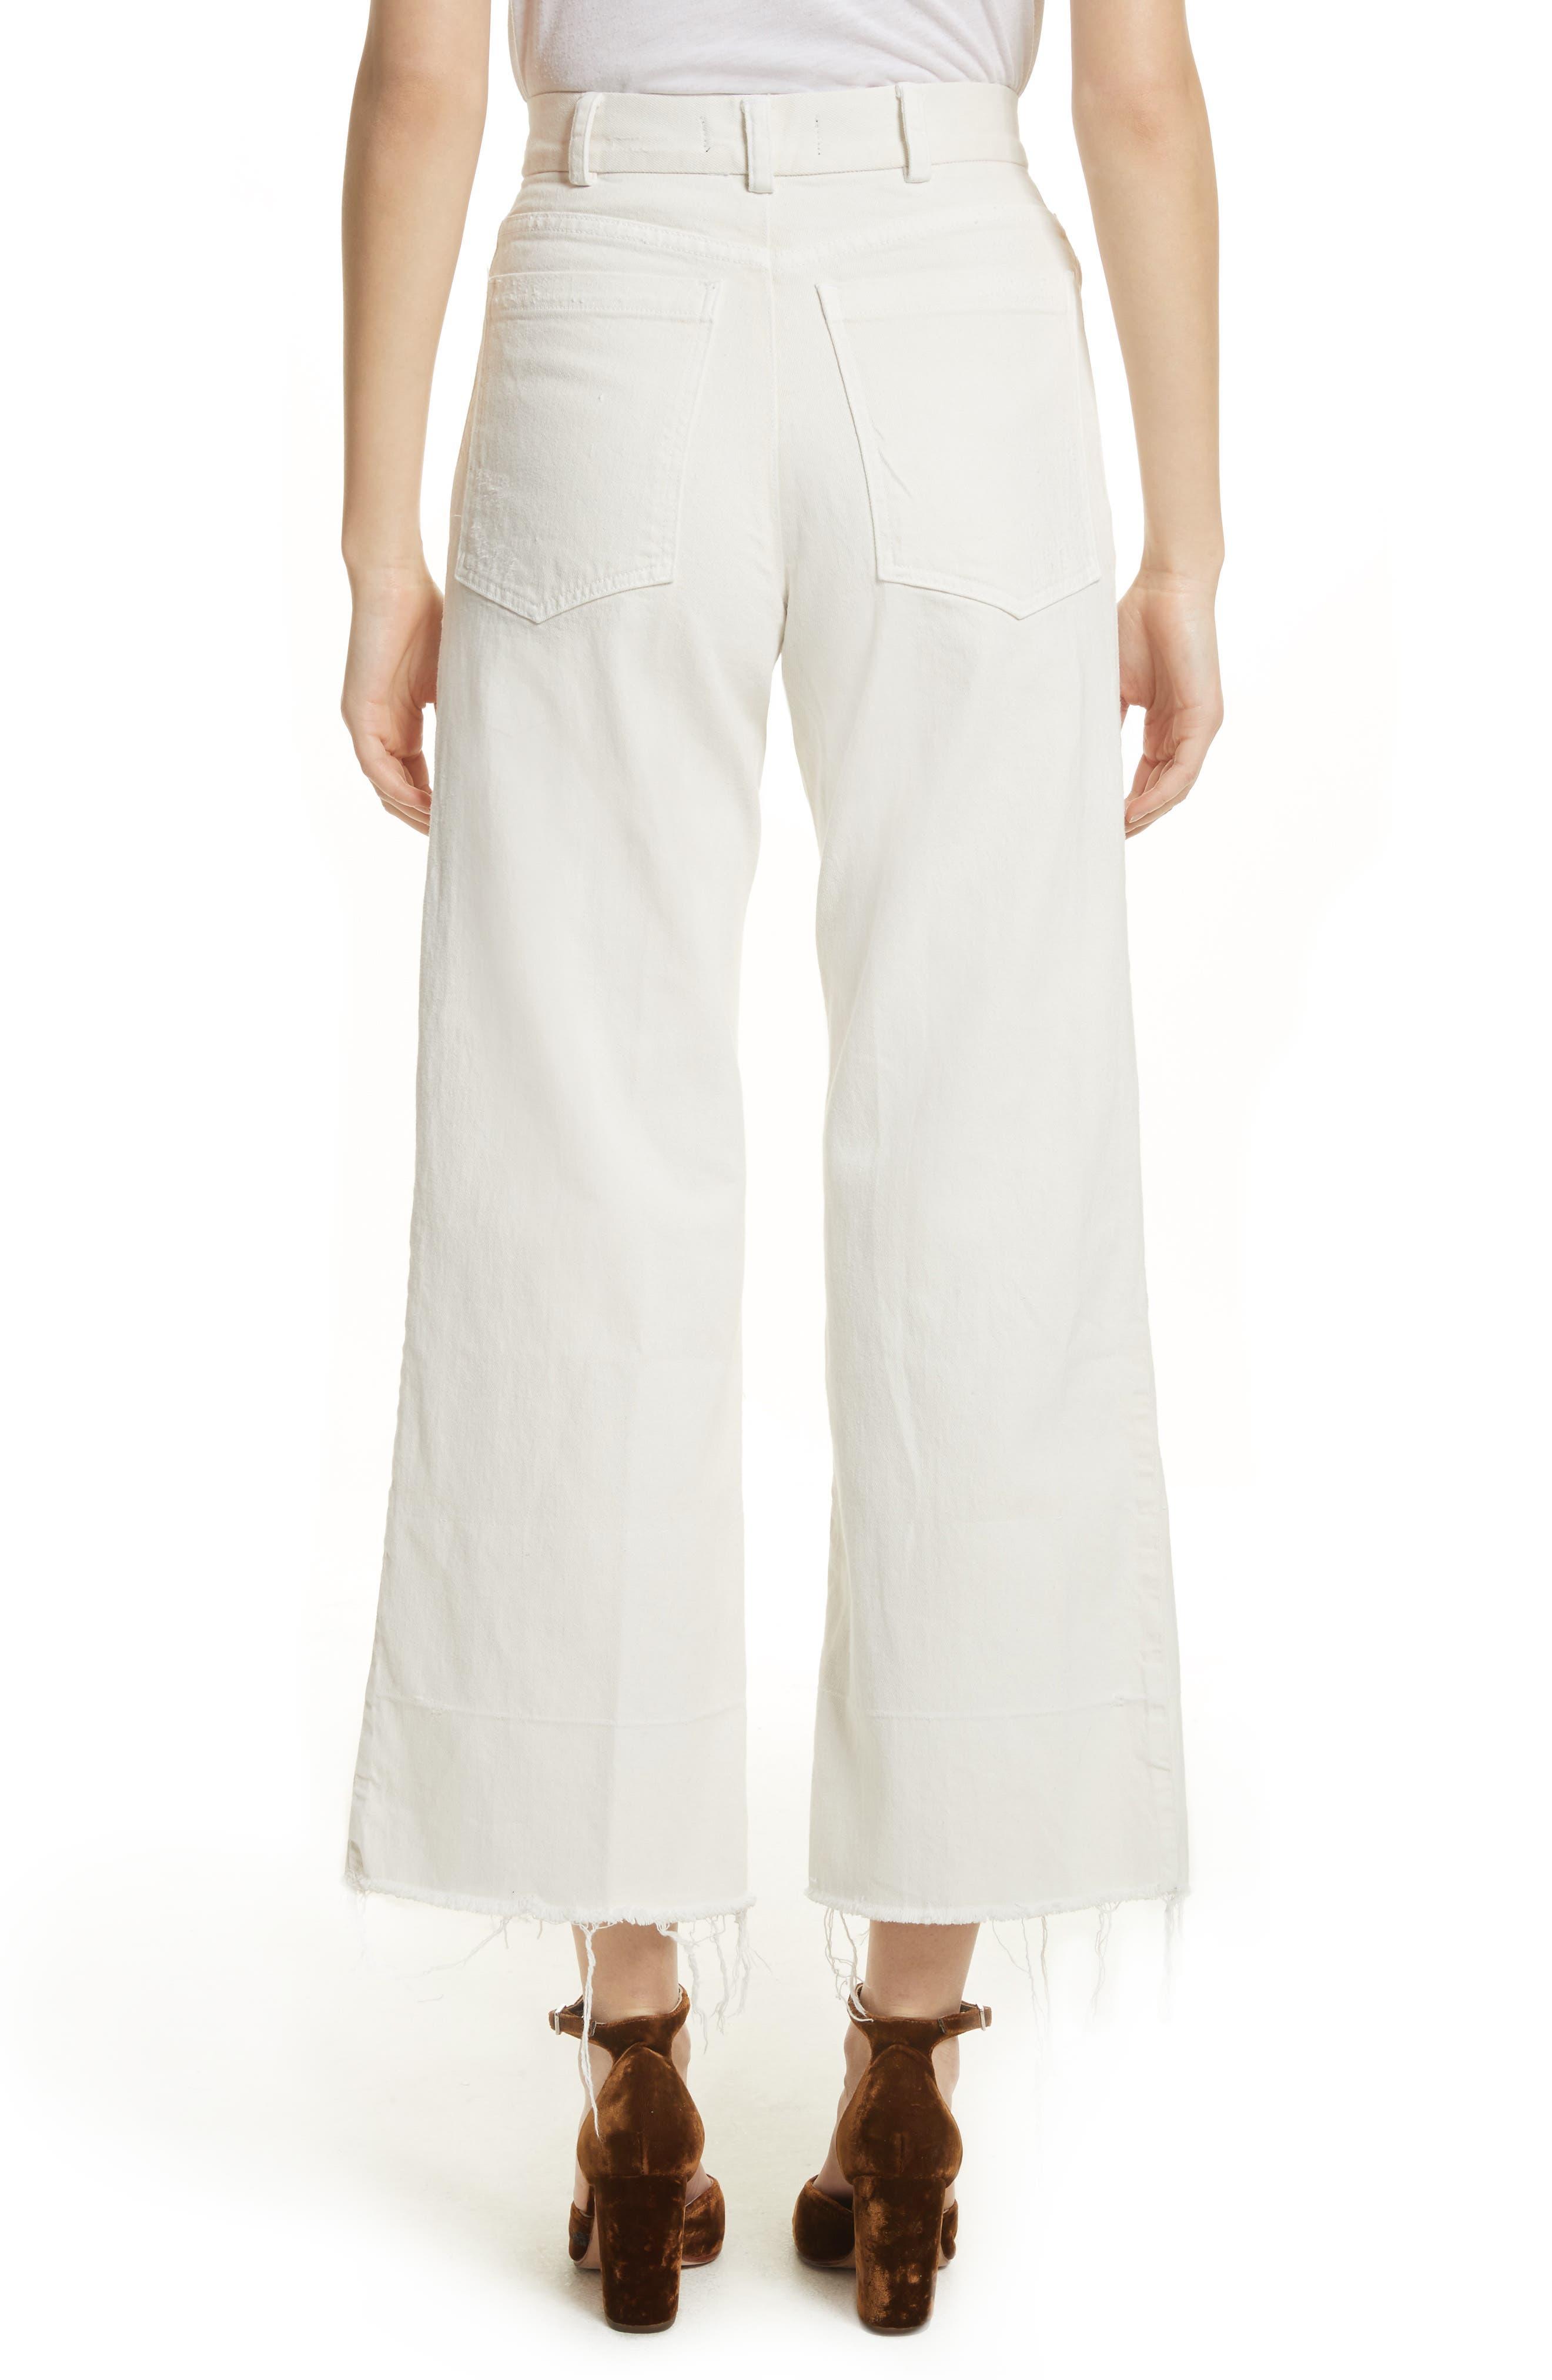 Rachey Comey Legion Crop Wide Leg Pants,                             Alternate thumbnail 2, color,                             Dirty White